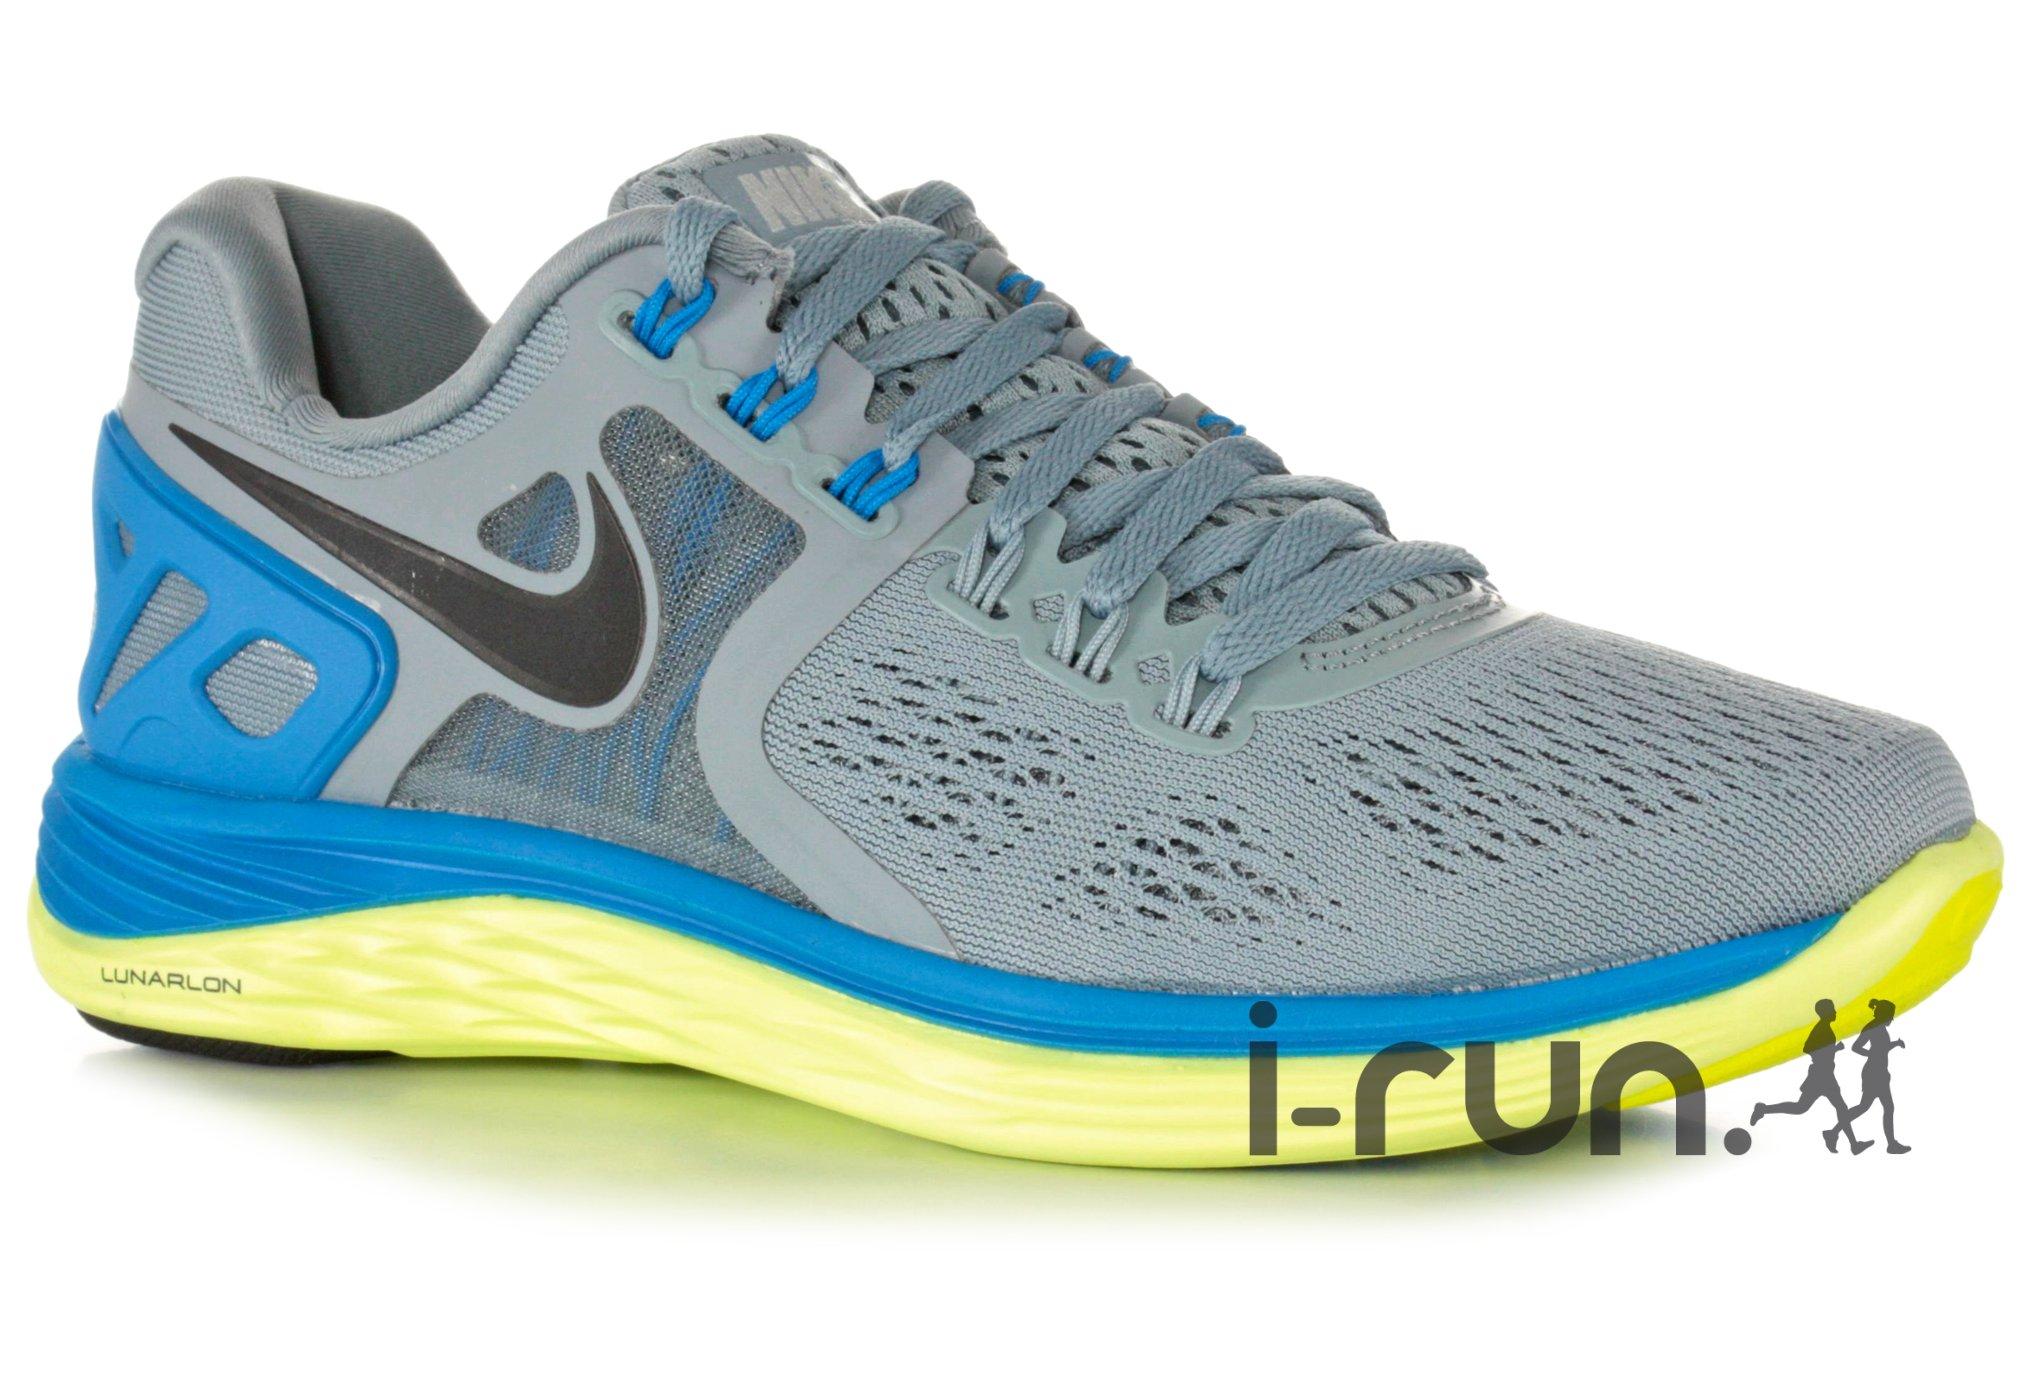 Nike lunareclipse 4 w pas cher destockage nike running lunareclipse 4 w en - Avis destockage fitness ...